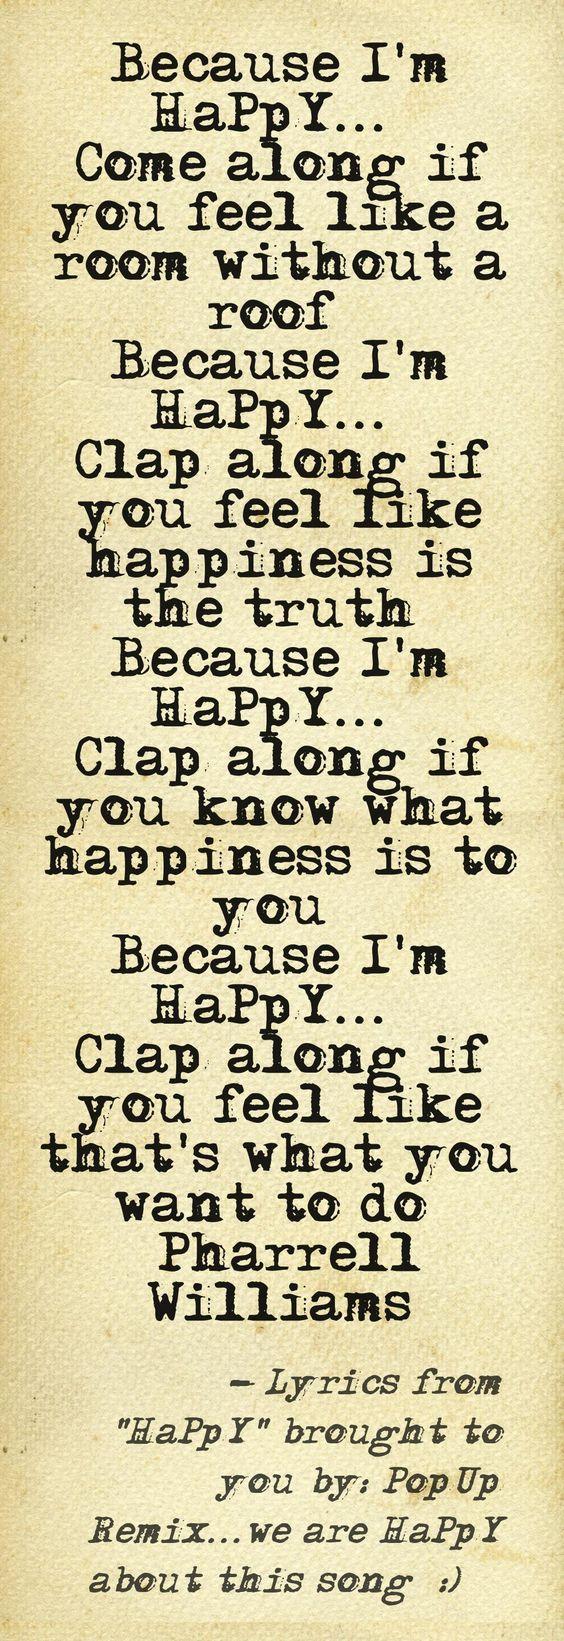 Because I'm Happy - Pharrell Williams   Quotes + Wise ... Happy Song Lyrics Quotes